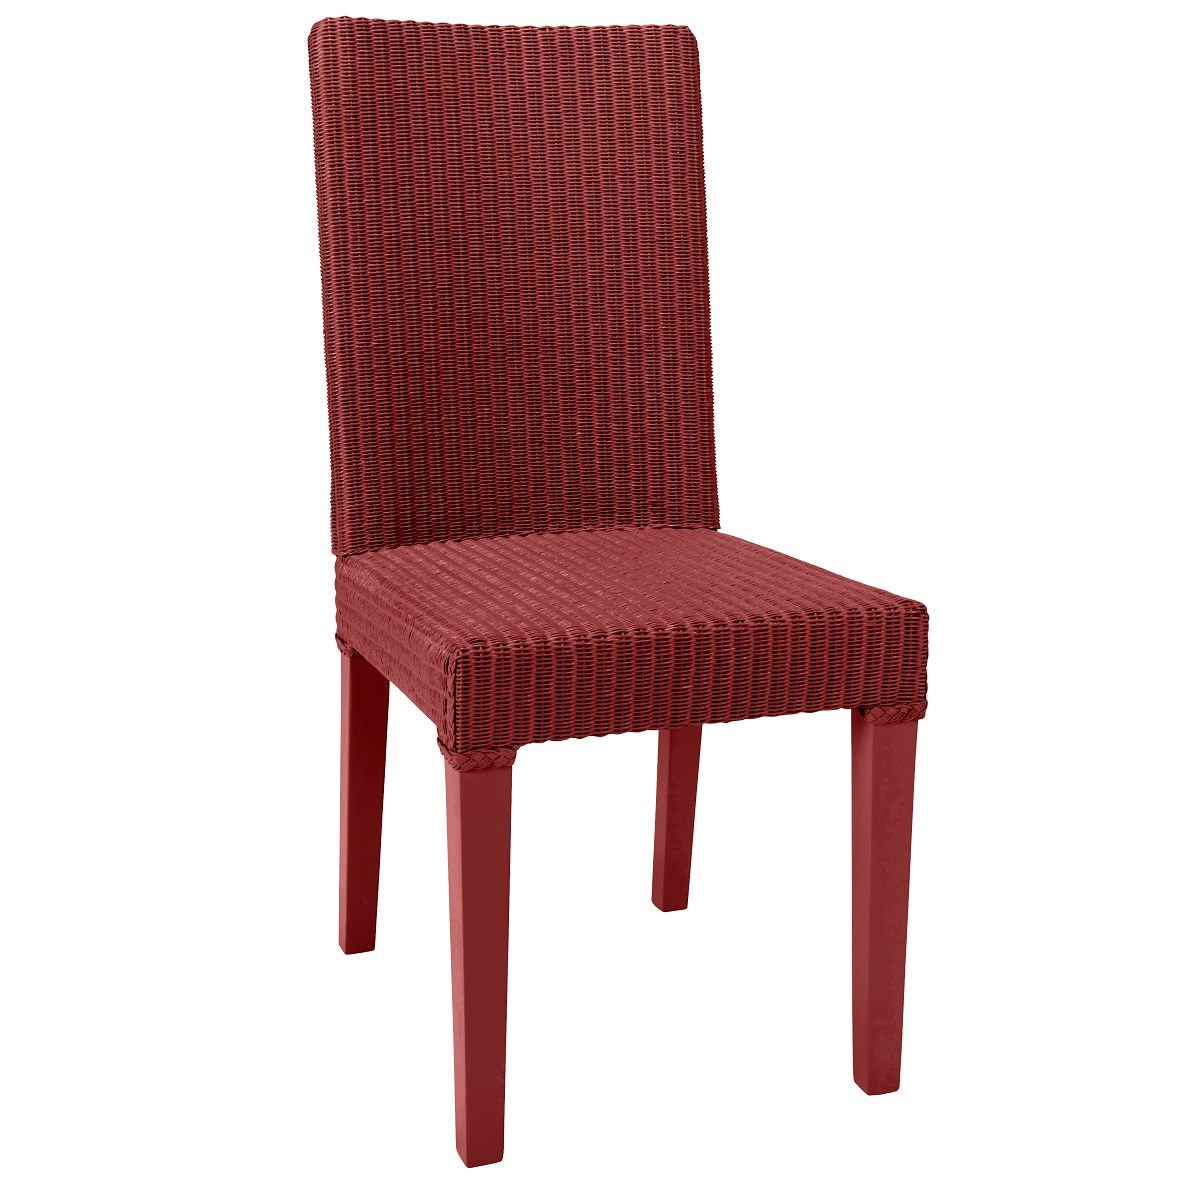 Chaise en Lloyd Loom rouge